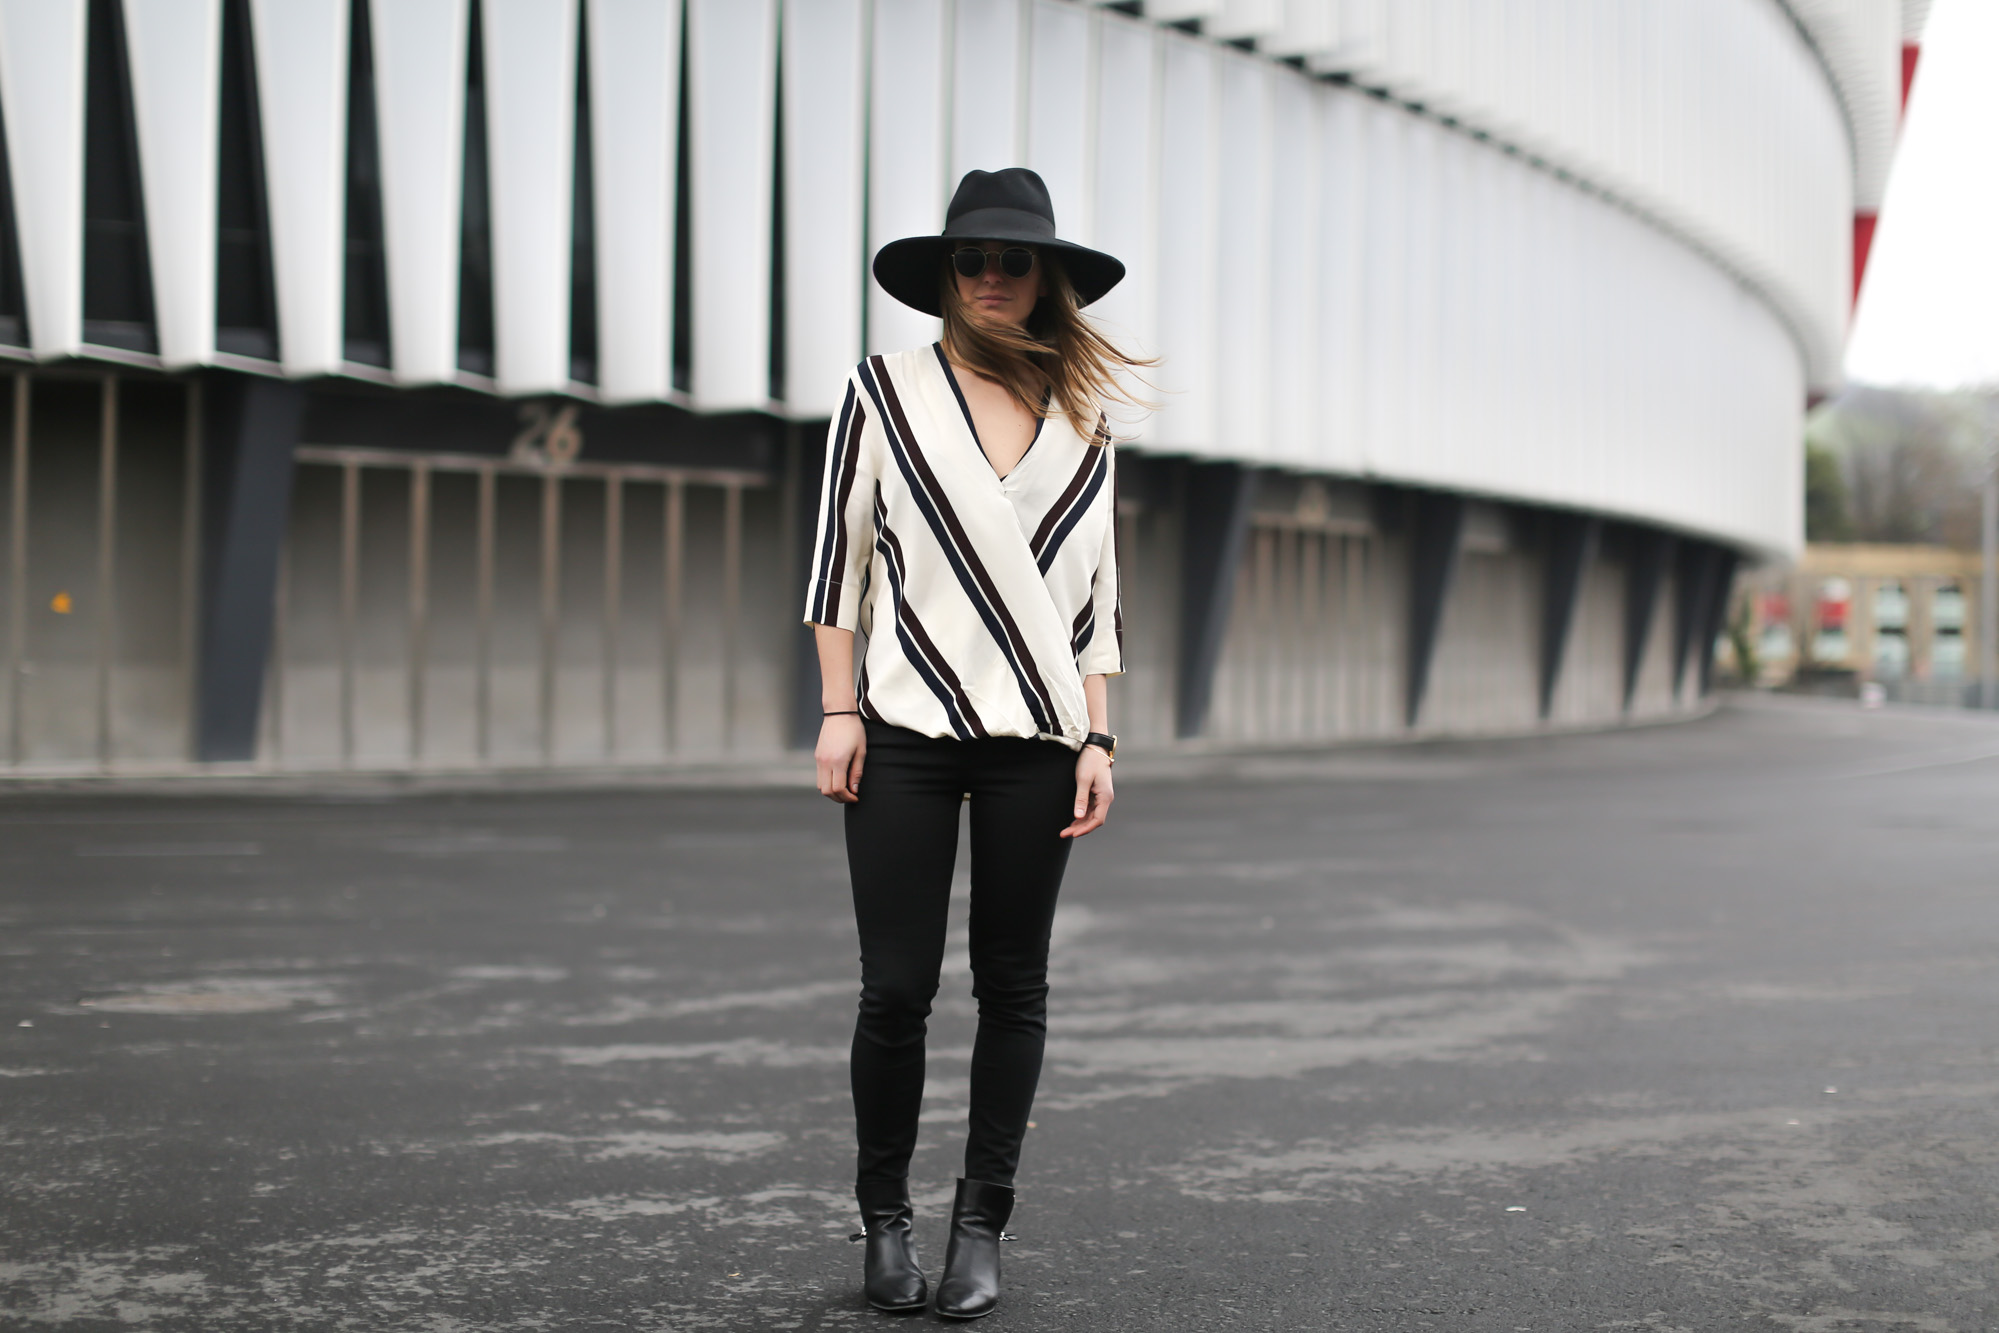 Clochet-streetstyle-topshop-shirt-fedora-hat-mango-leather-biker-jacket-12